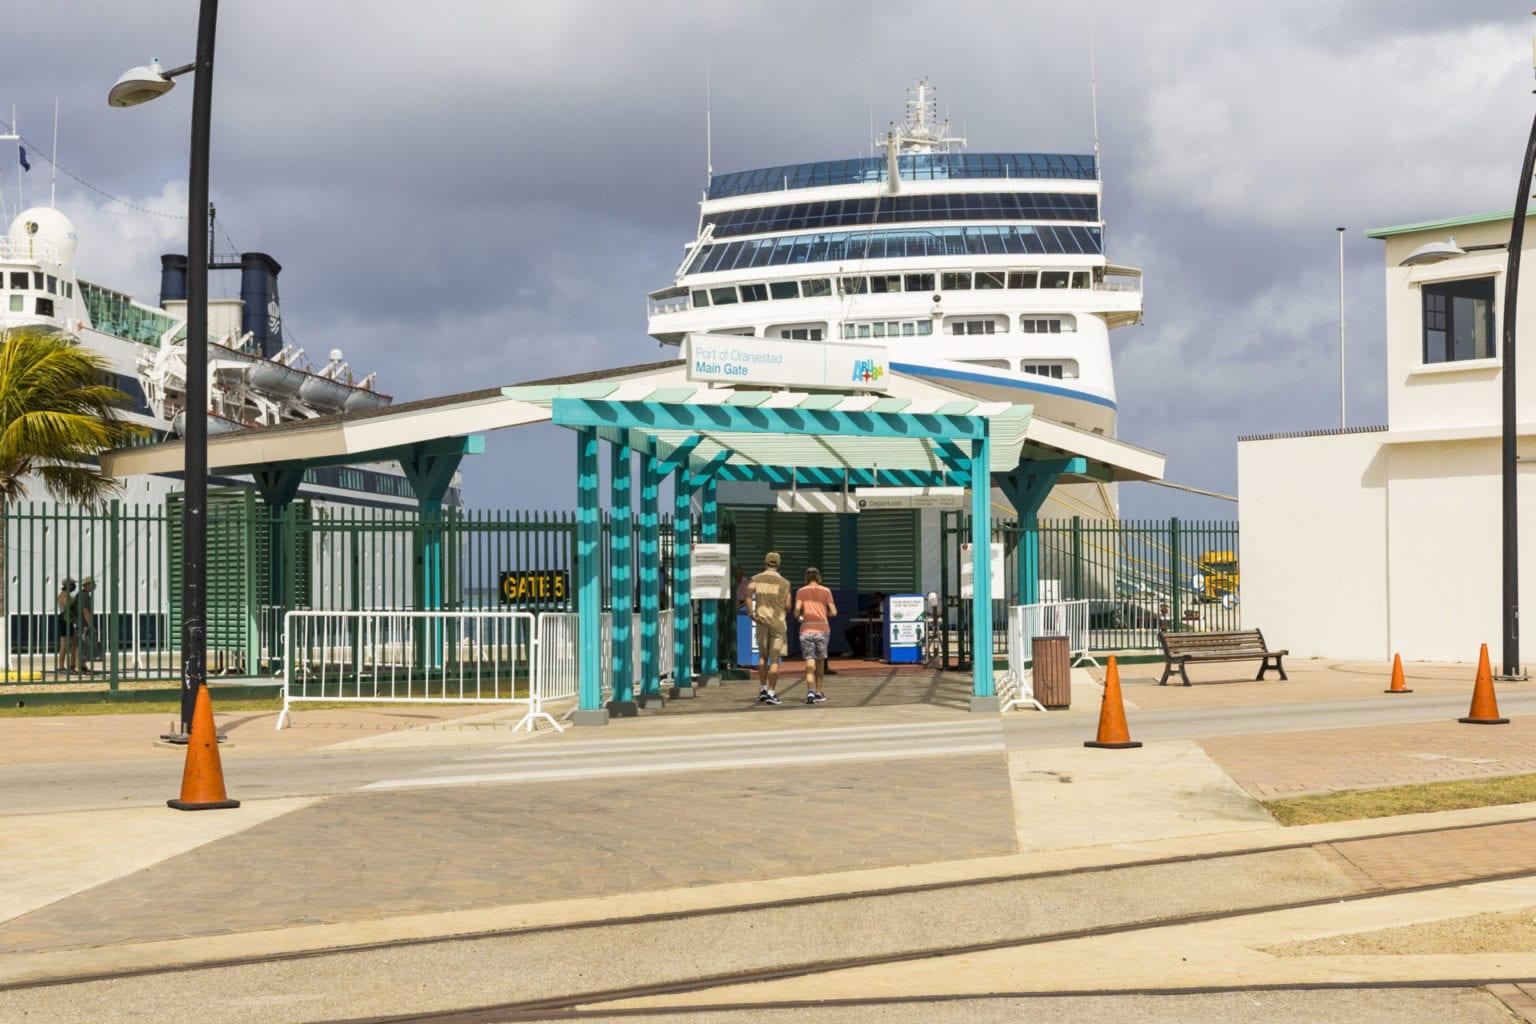 Asociacion Welcome Plaza contento cu reactivacion di industria crucero